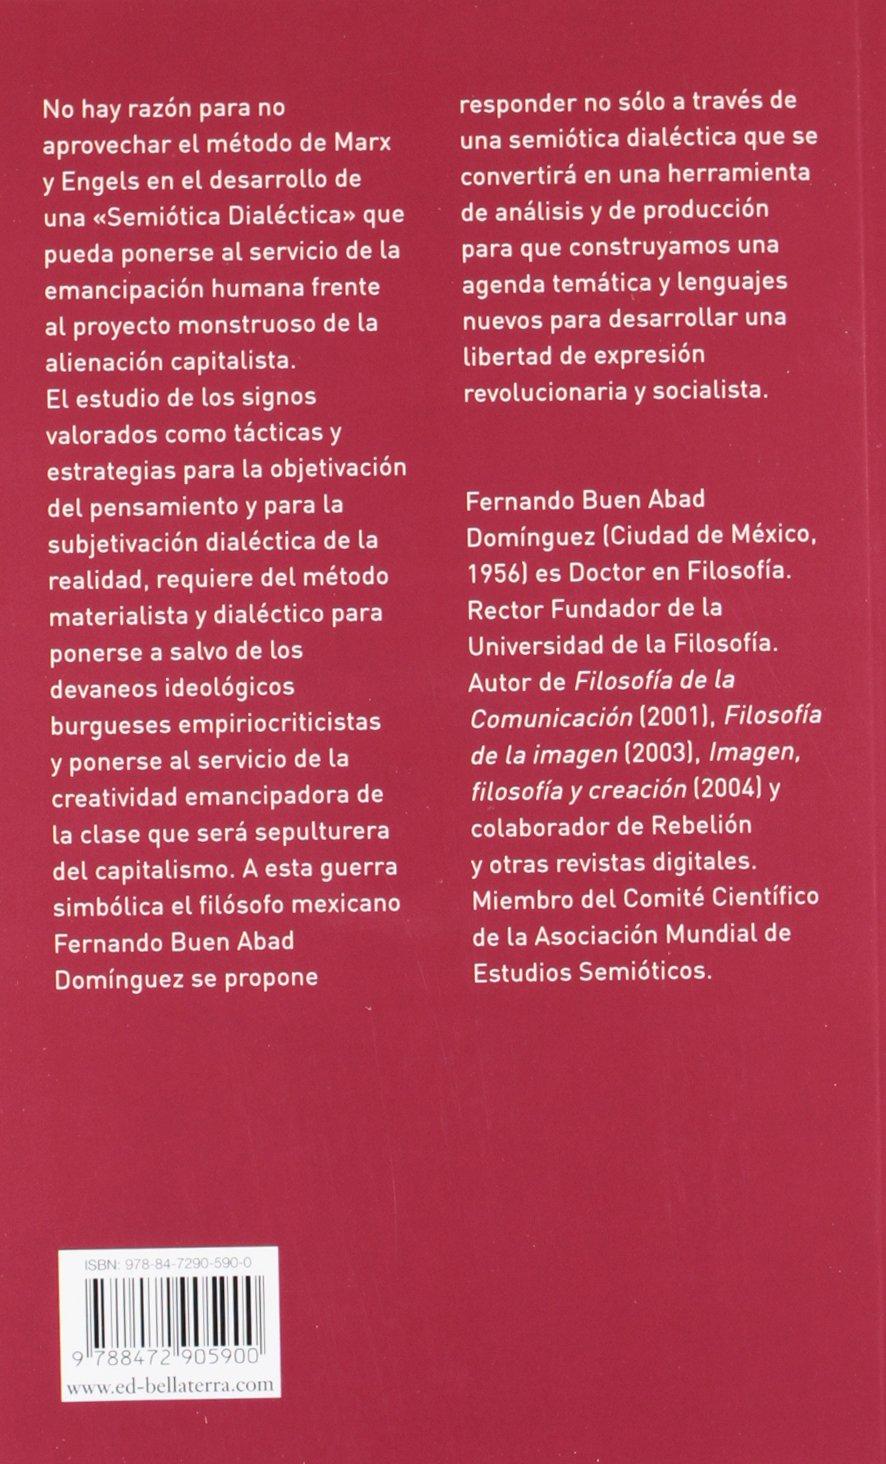 La guerra simbólica: Fernando Buen Abad Domínguez ...